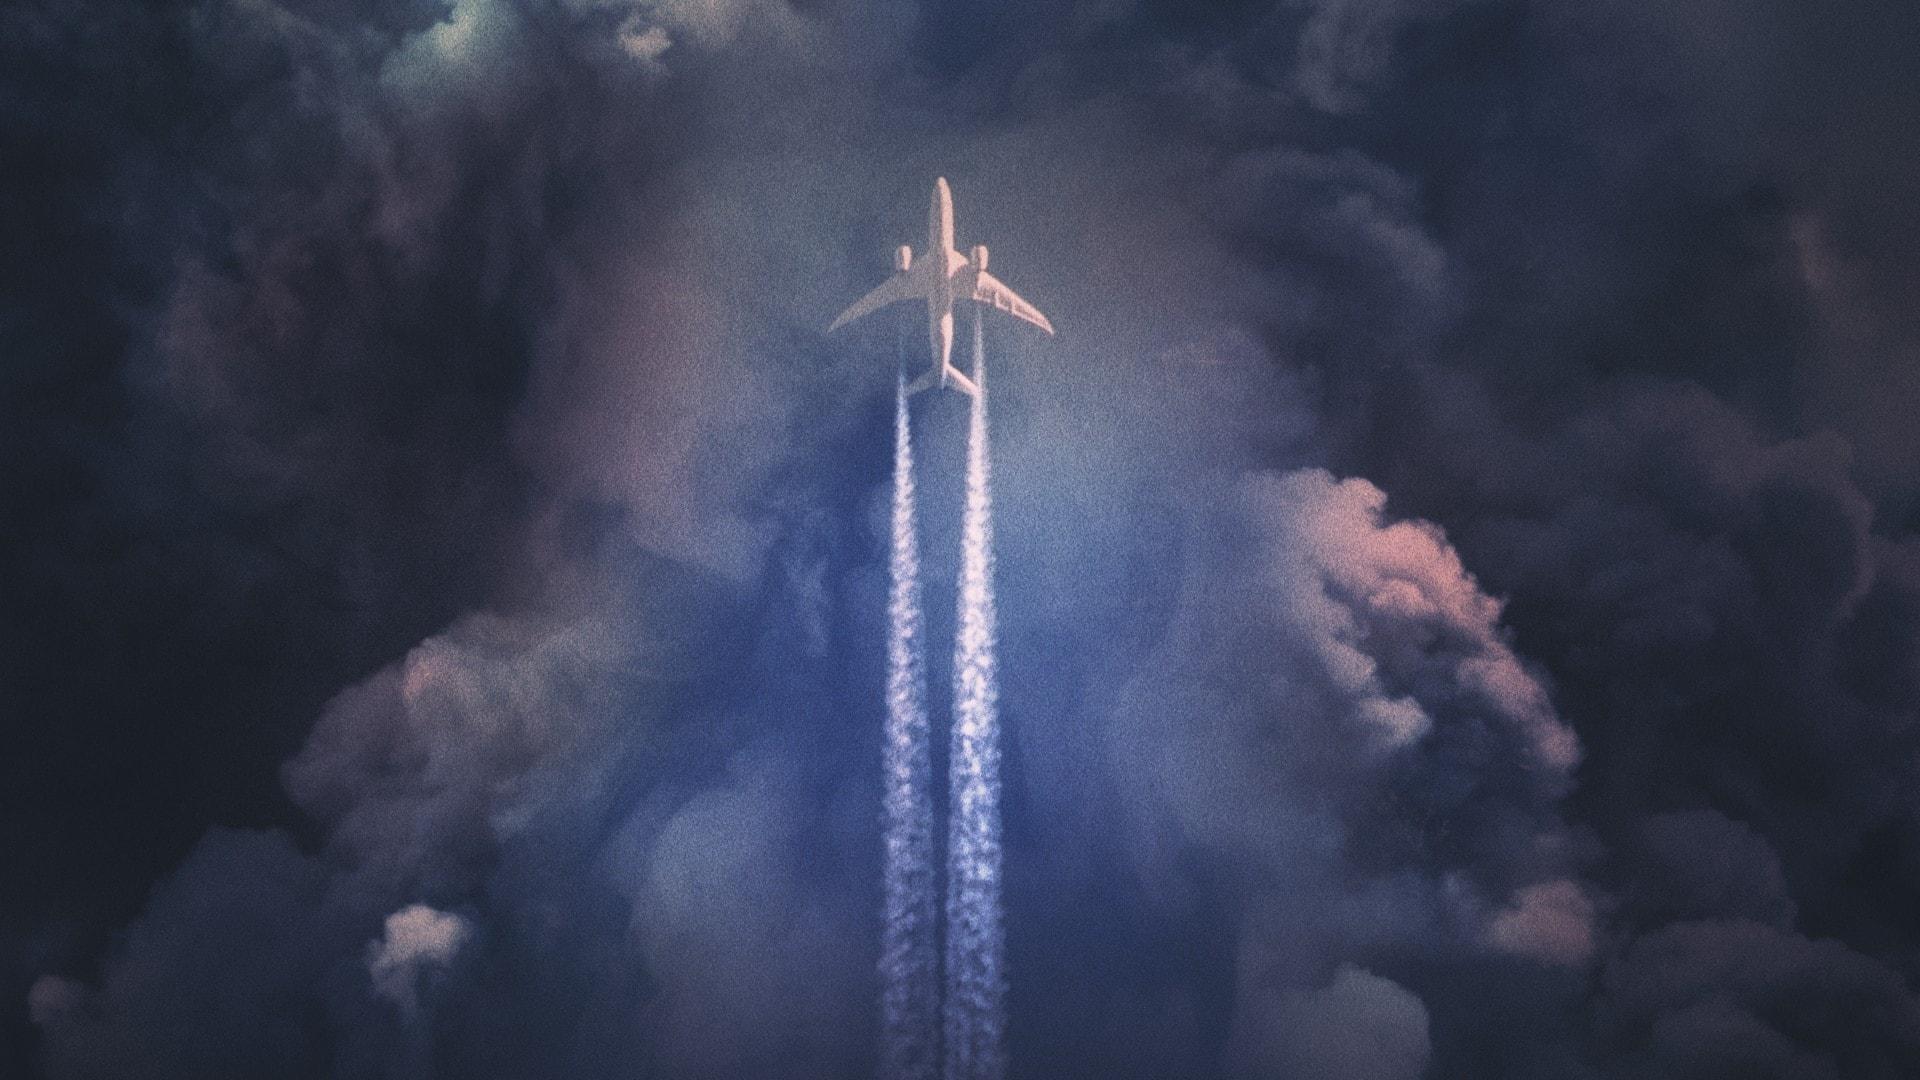 Geoengineering - Att manipulera klimatet